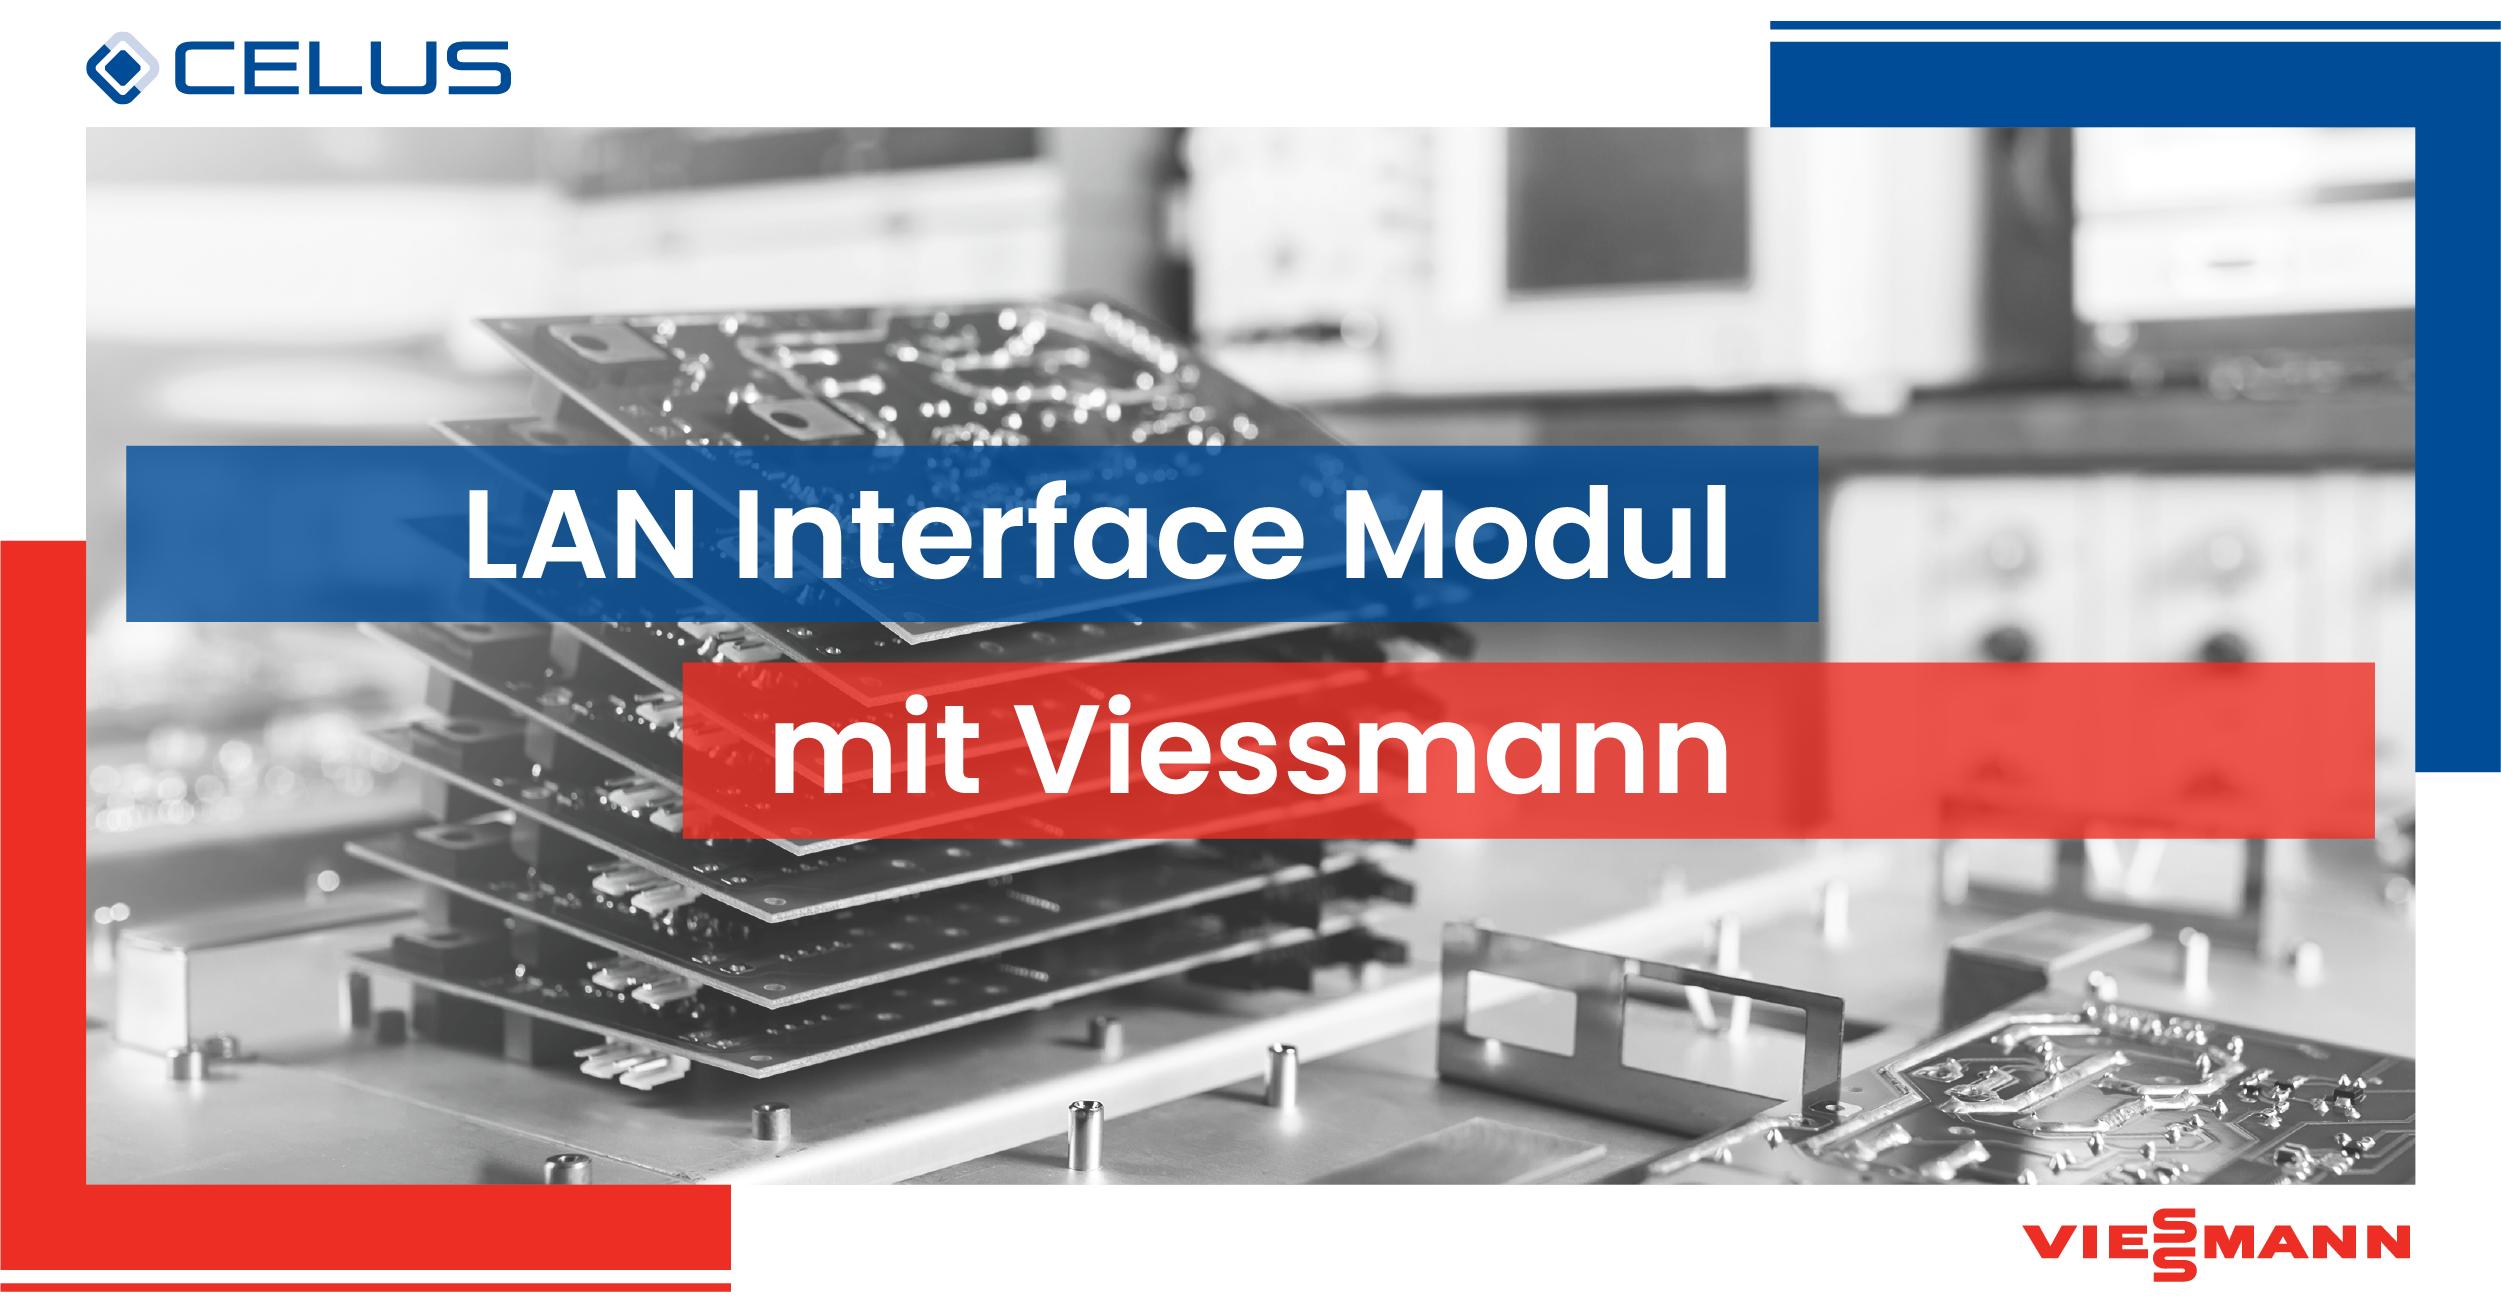 Viessmann Linkedin 31.05.2021_LinkedIN-08